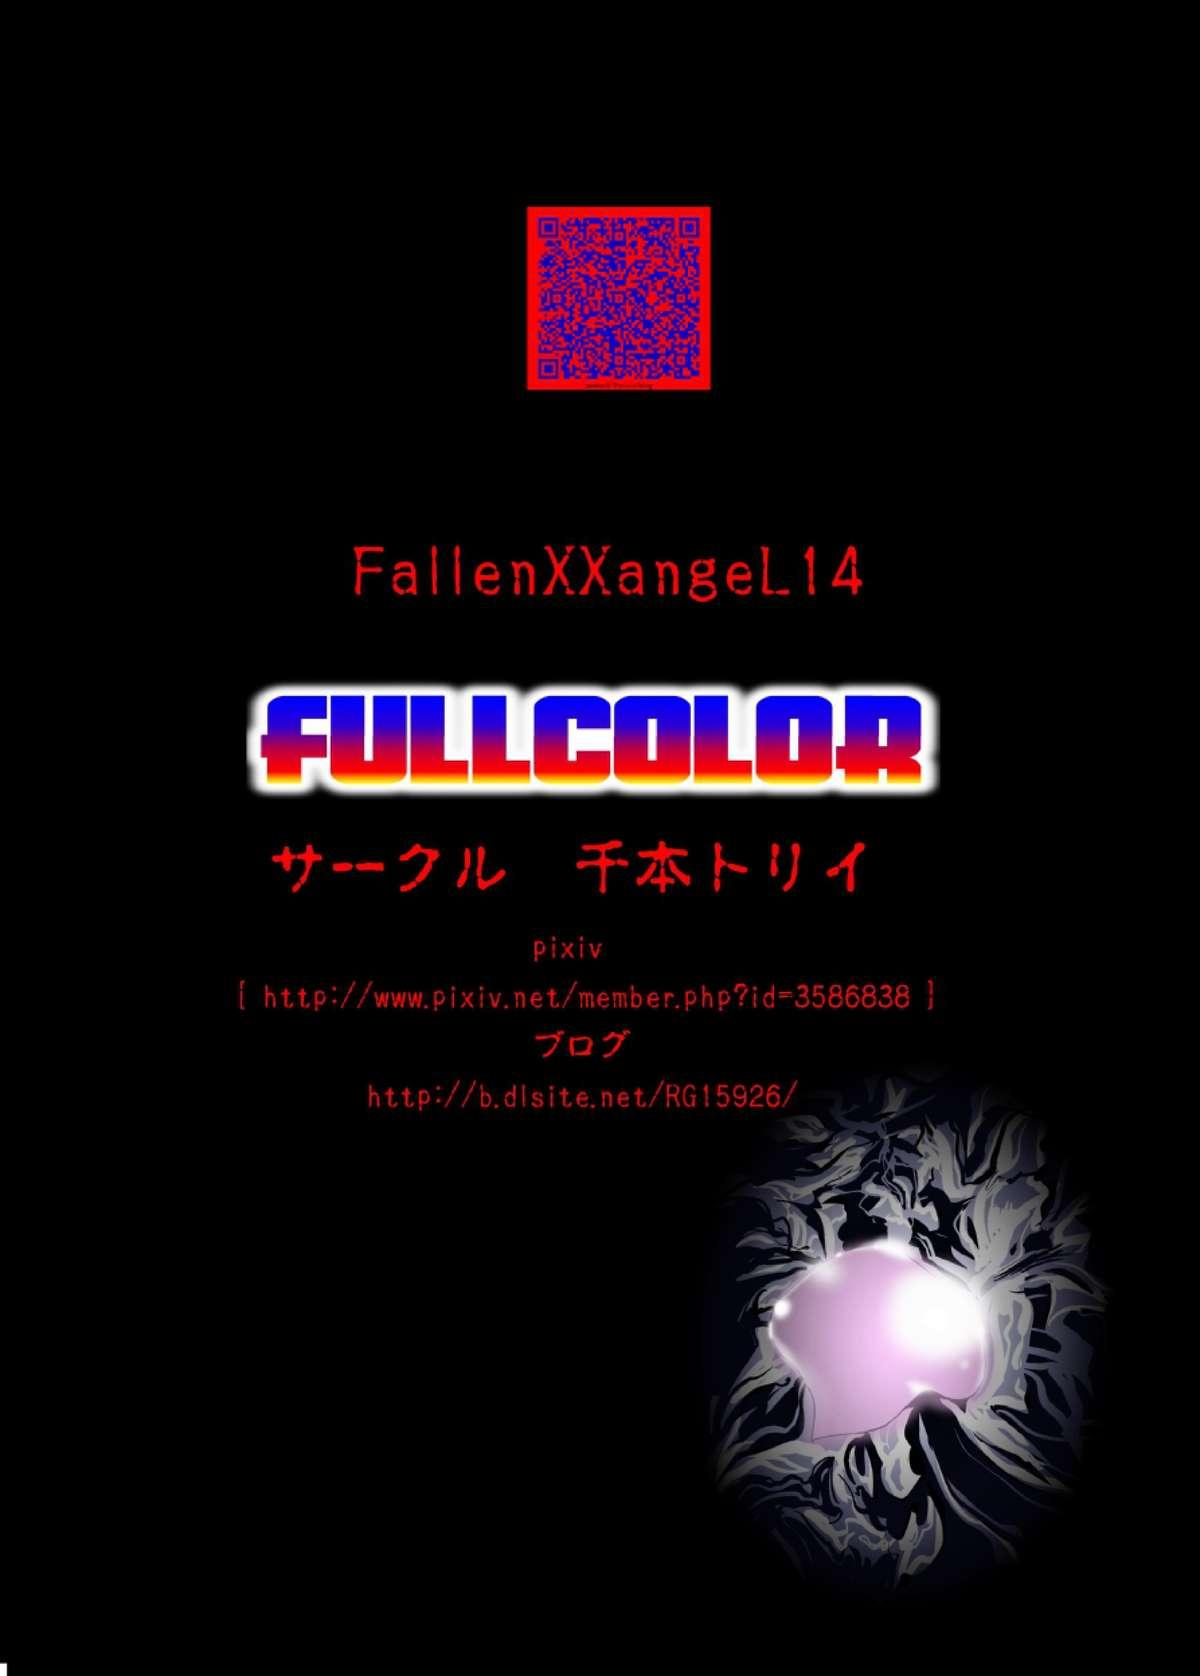 FallenXXangeL The Last Stage 4 FULLCOLOR 43